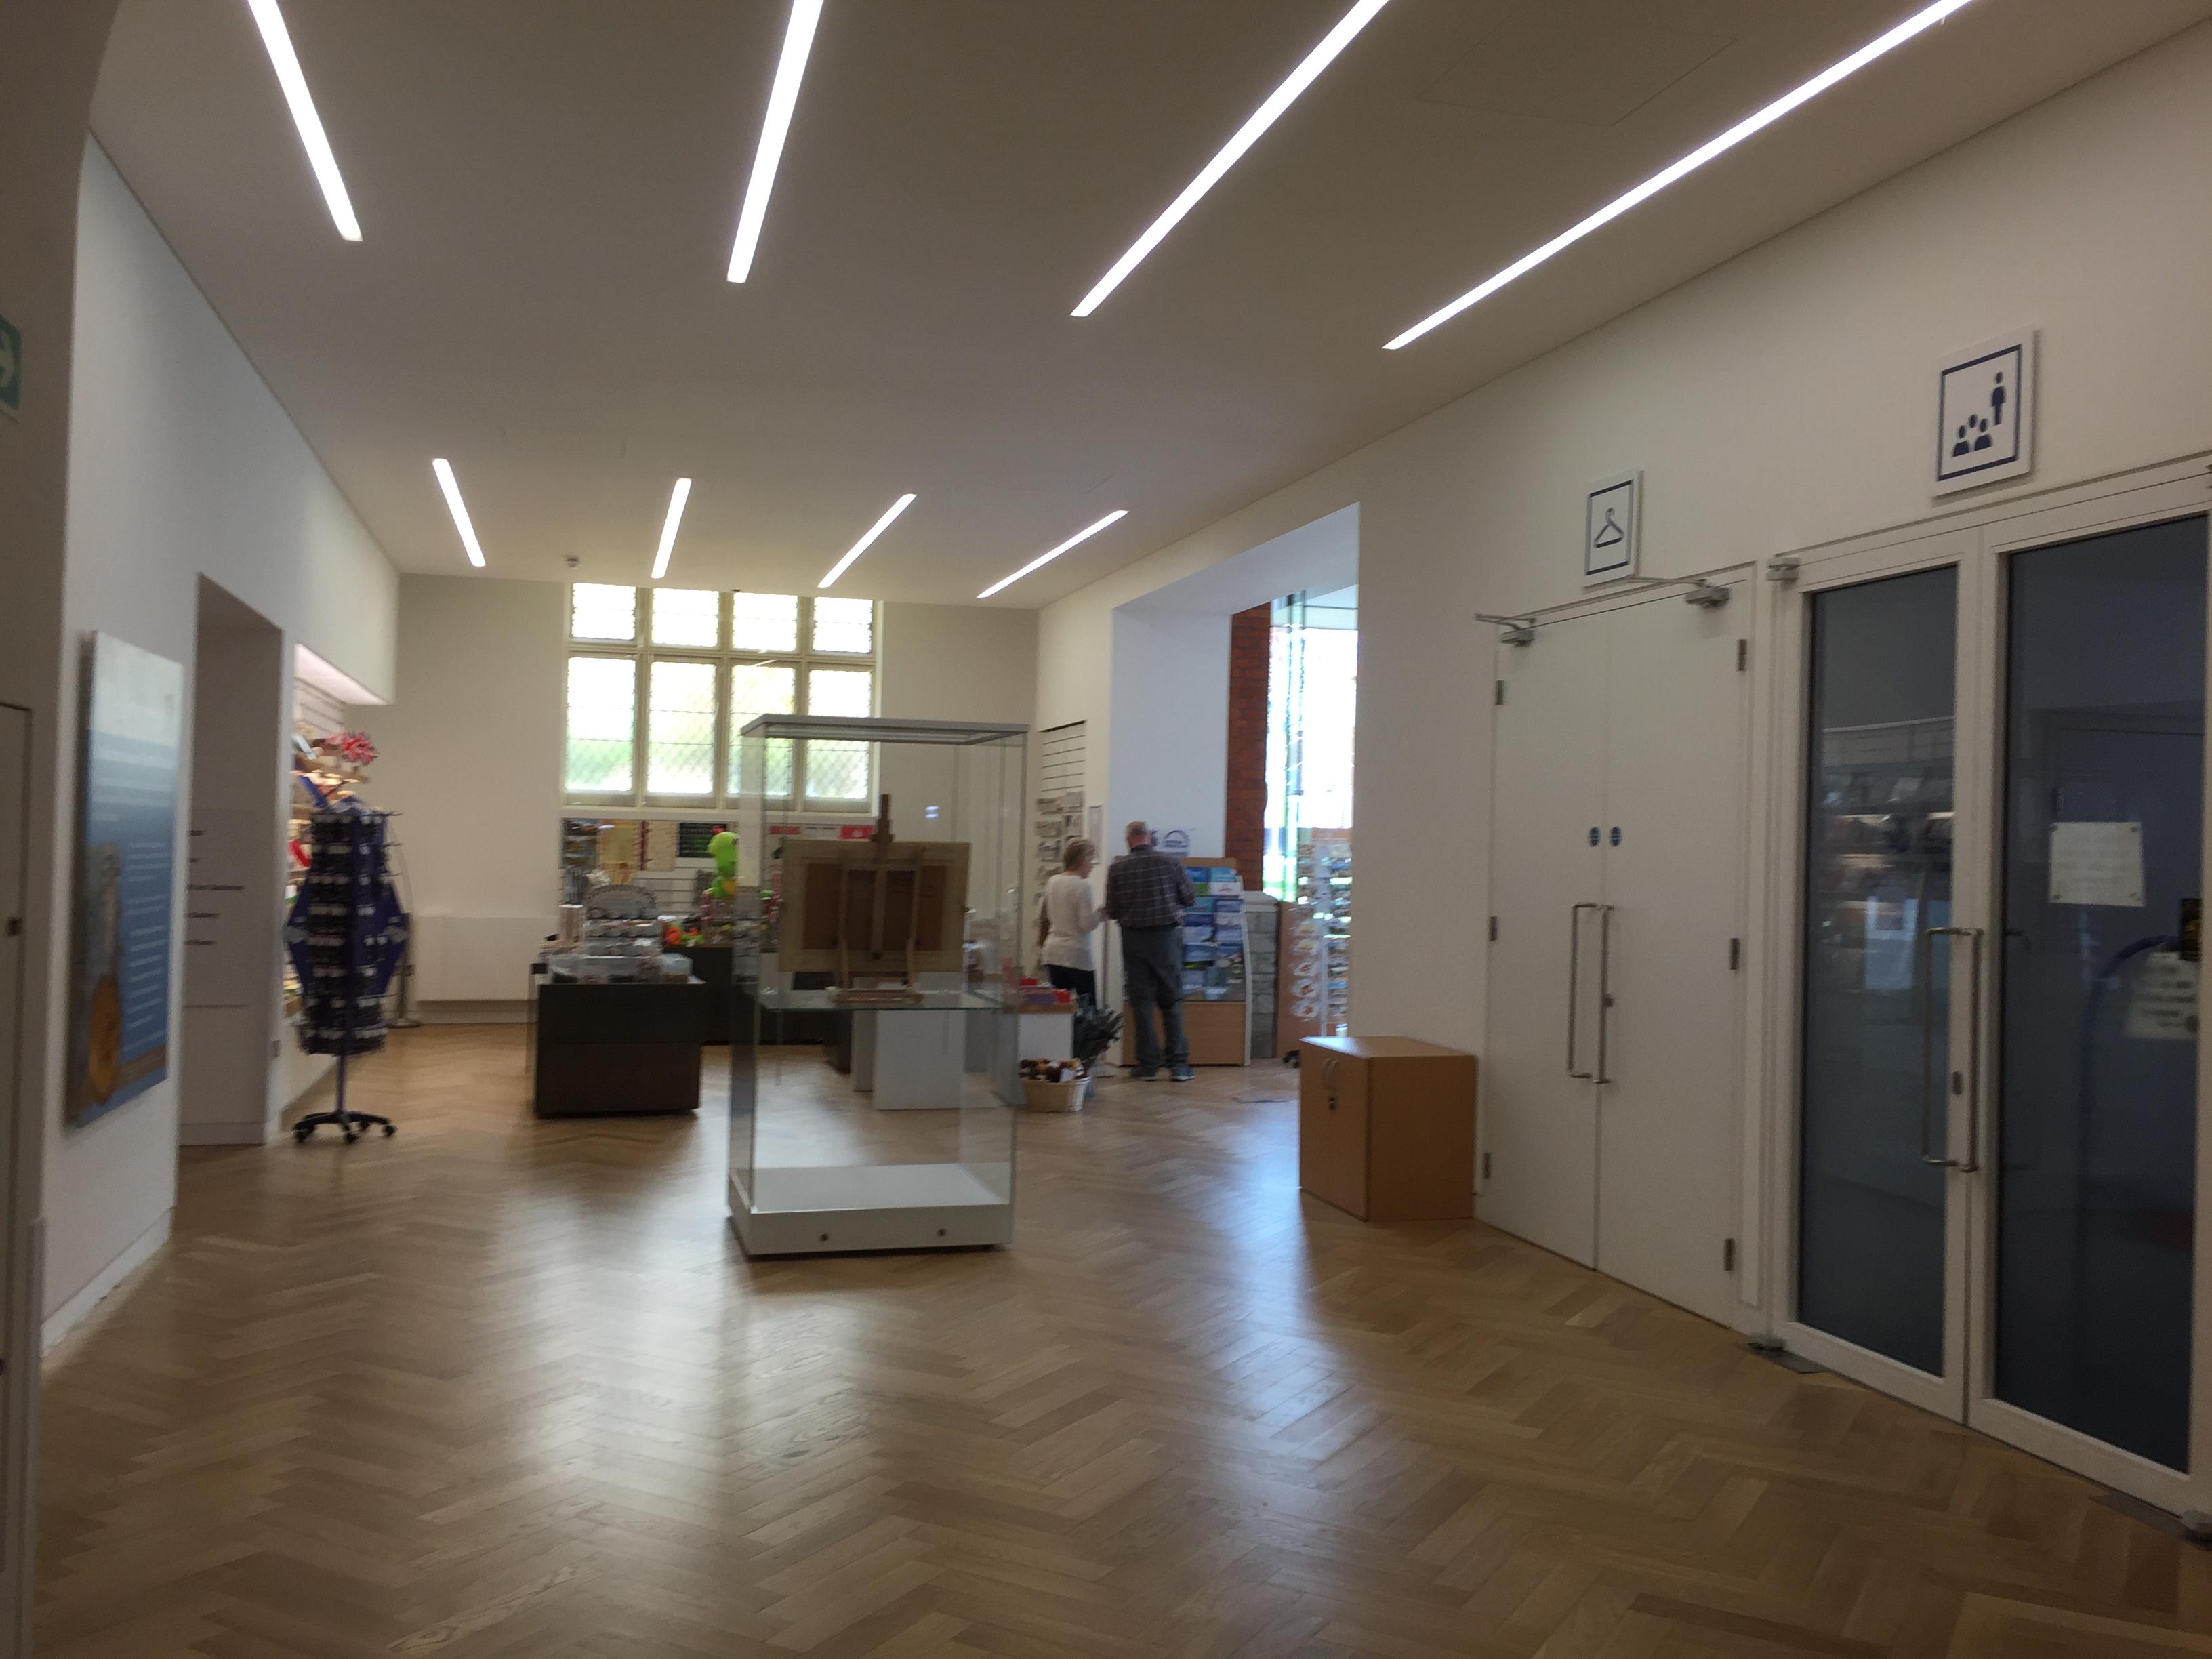 Maidstone Museum, Kent  Museum Visits